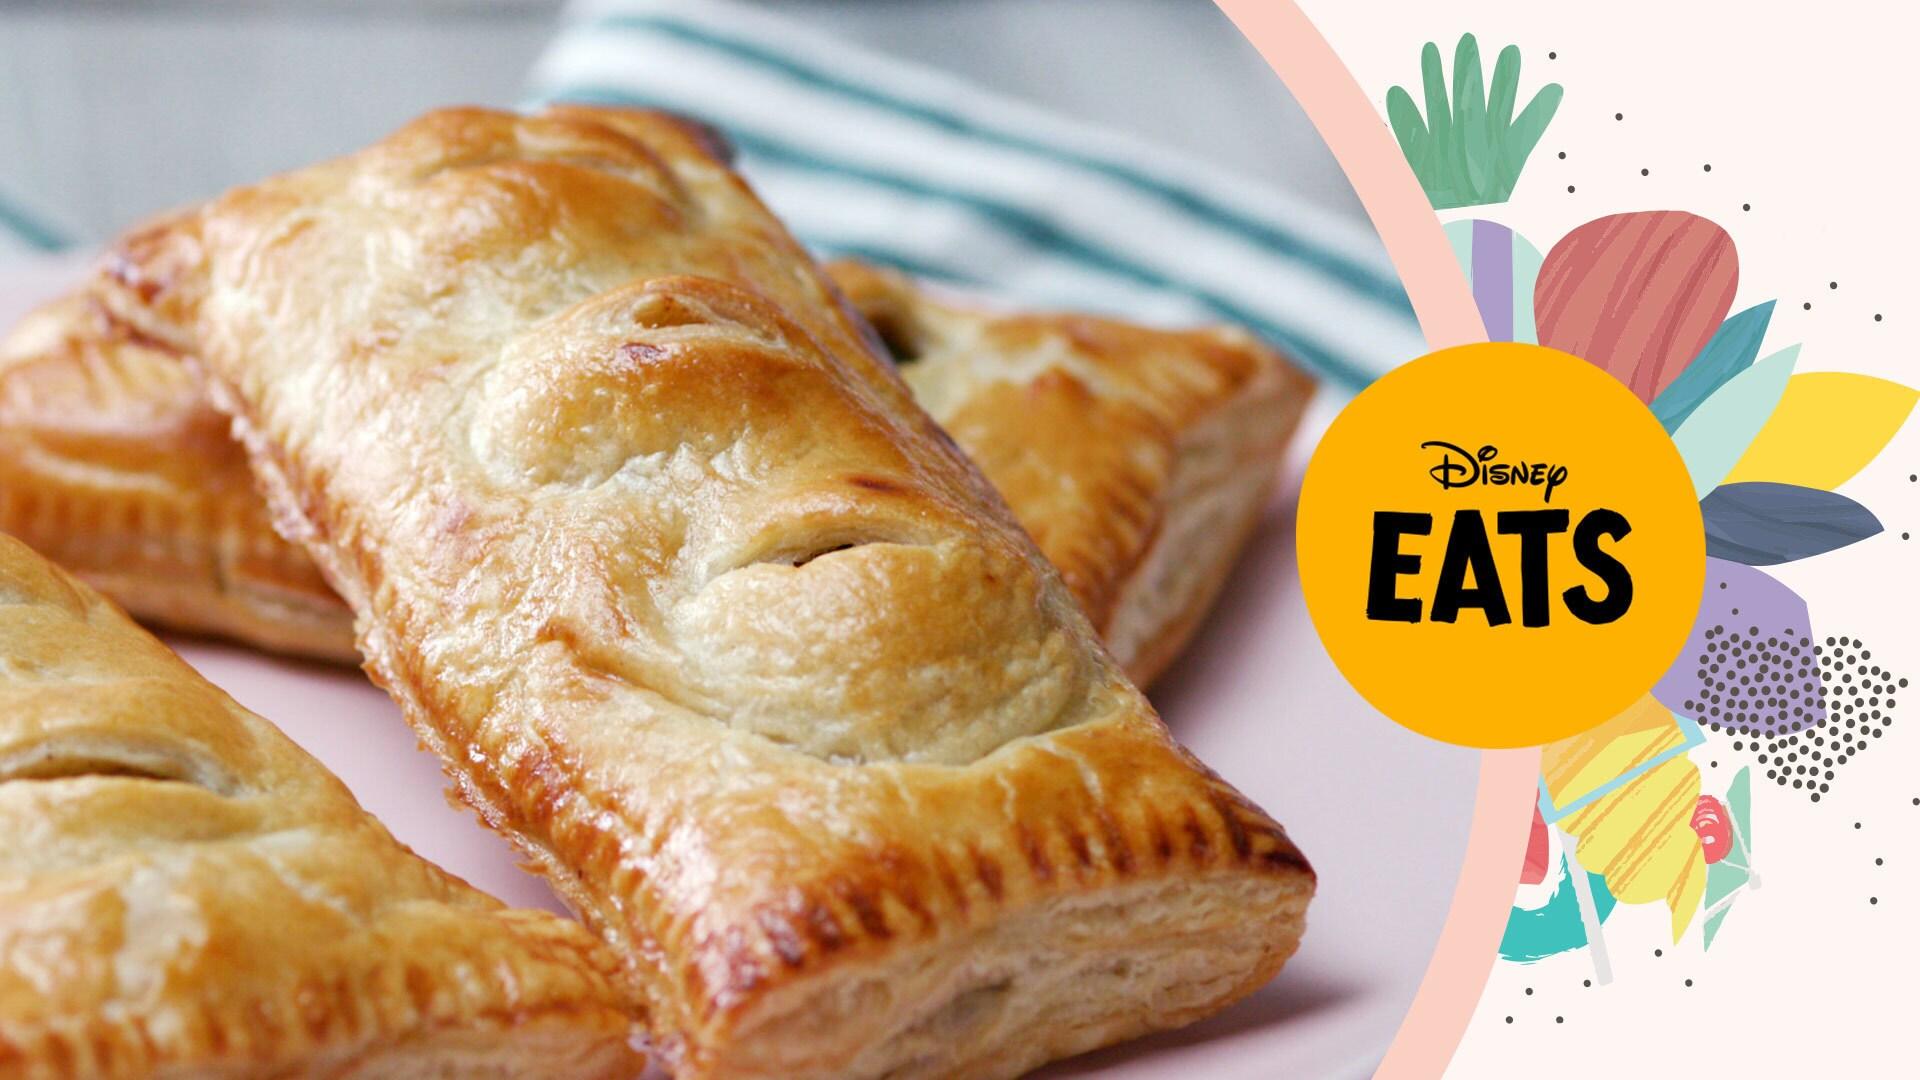 Swedish Chef's Meatball Pies | Disney Eats